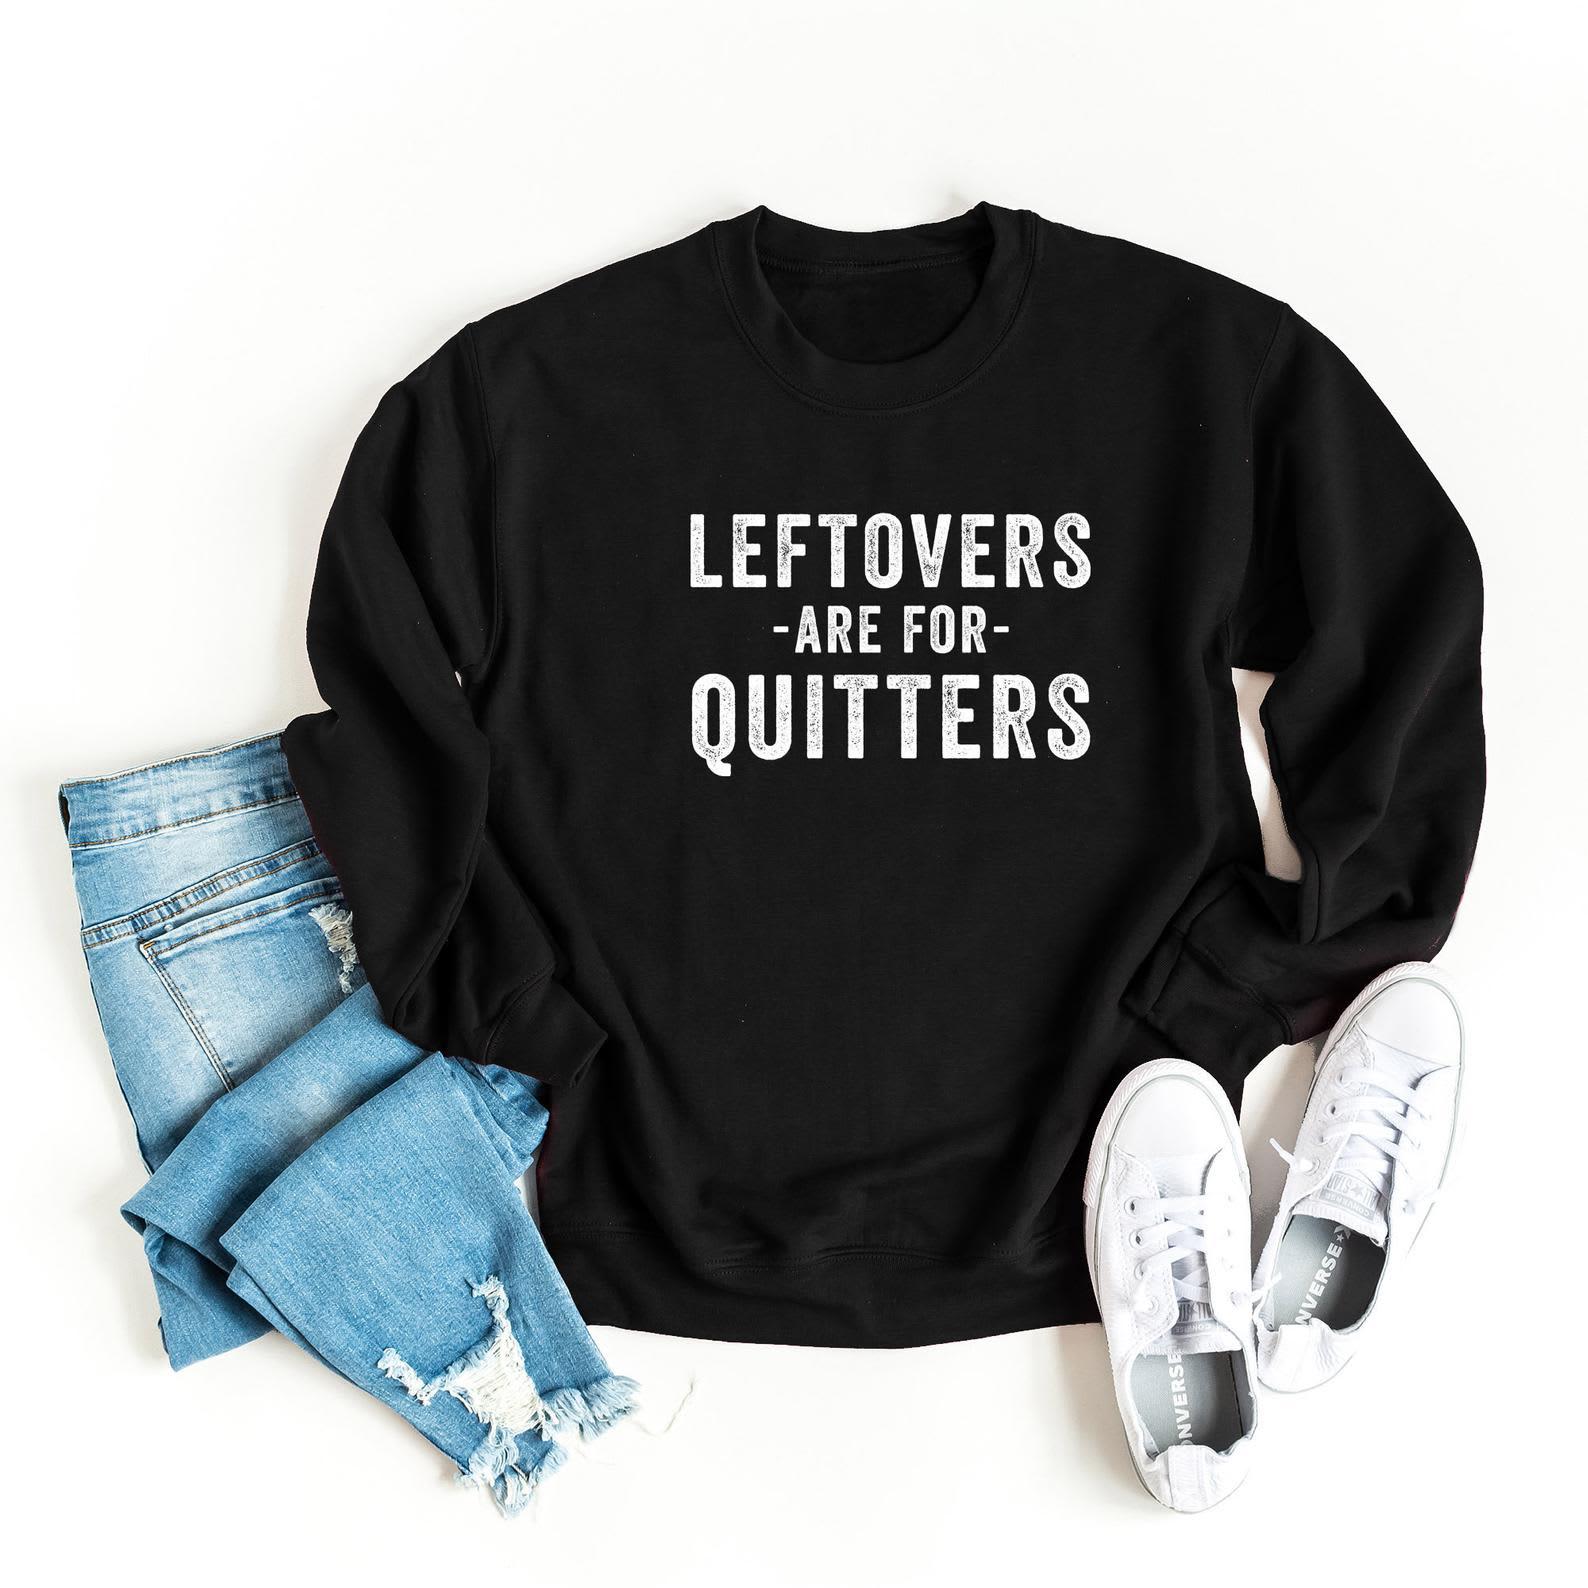 Funny Food Themed T-Shirts and Sweatshirts   Kitchn